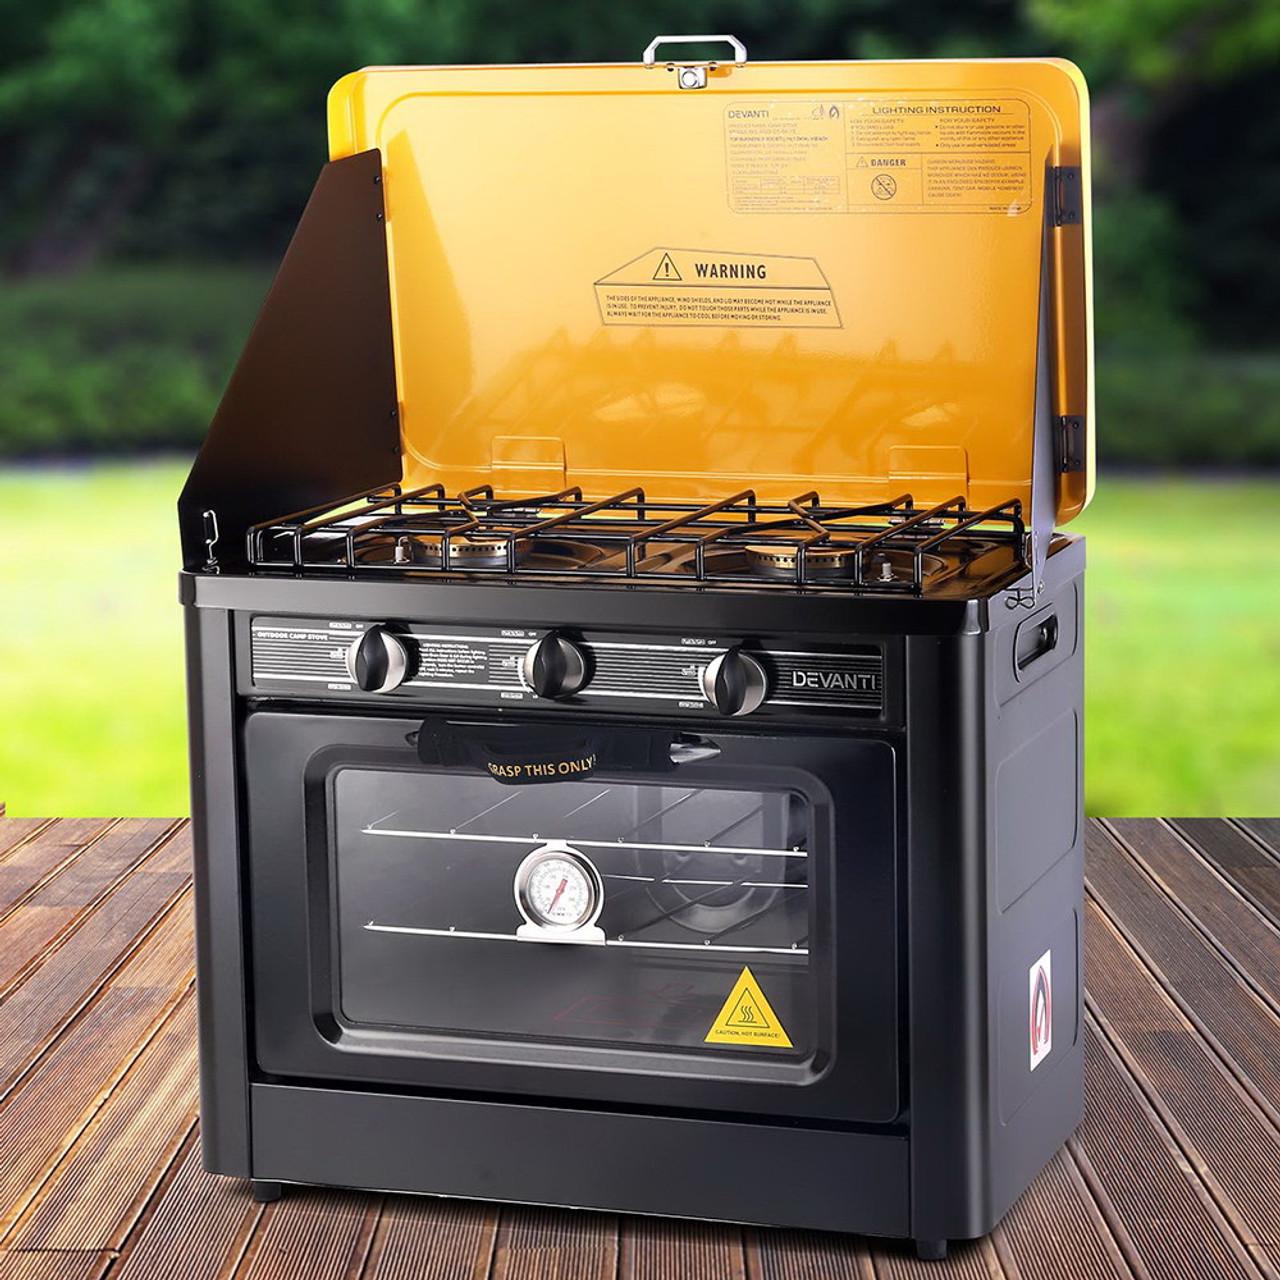 Devanti 3 Burner Portable Gas Oven LPG Camp Stove  - Black & Yellow